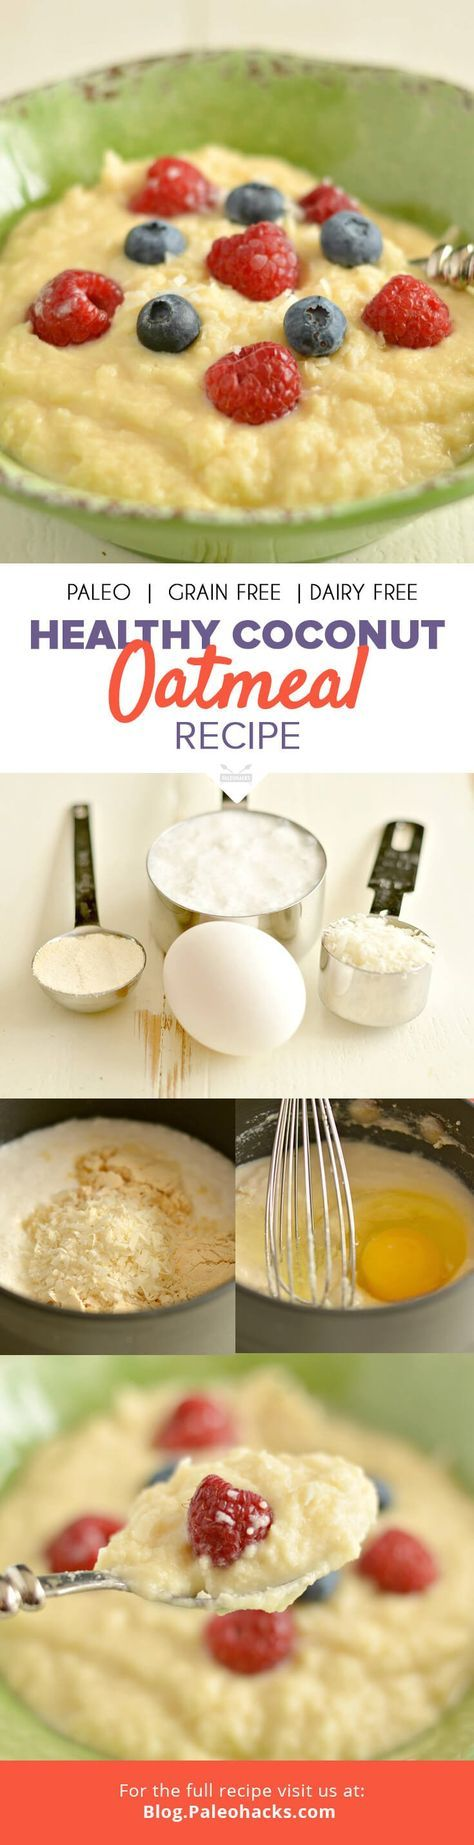 Healthy Coconut 'Oatmeal'